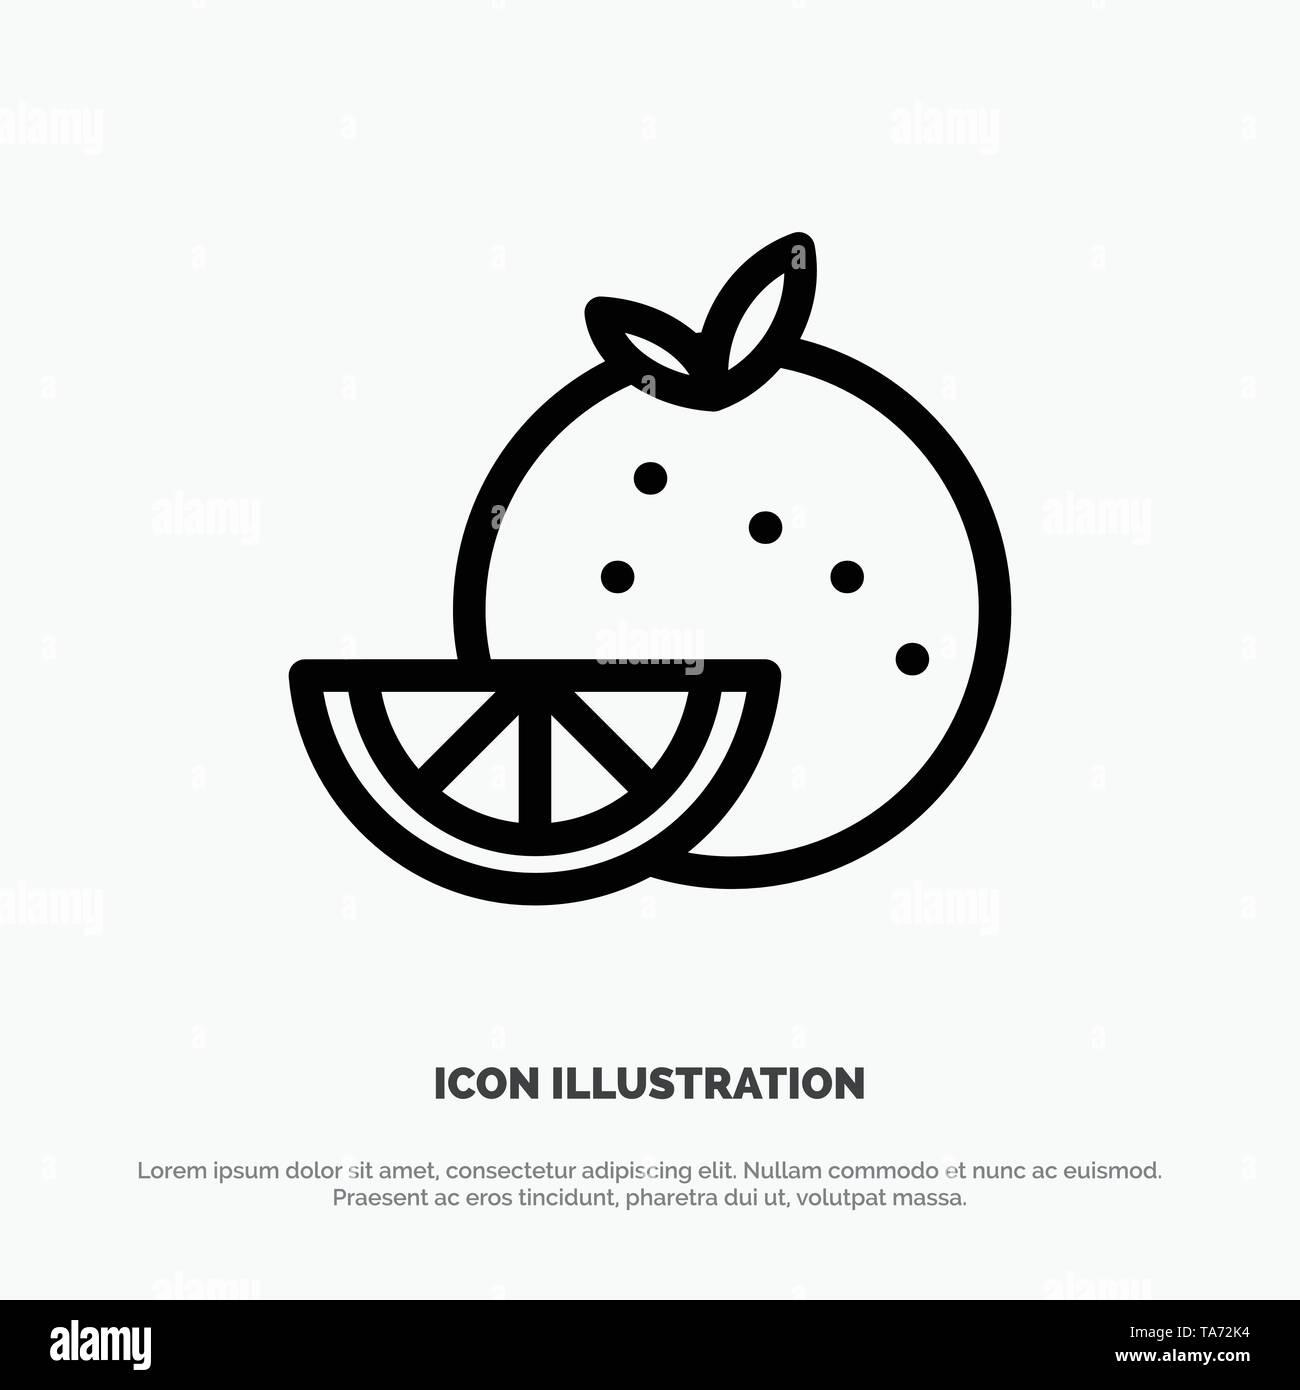 Orange, Food, Fruit, Madrigal Line Icon Vector - Stock Image